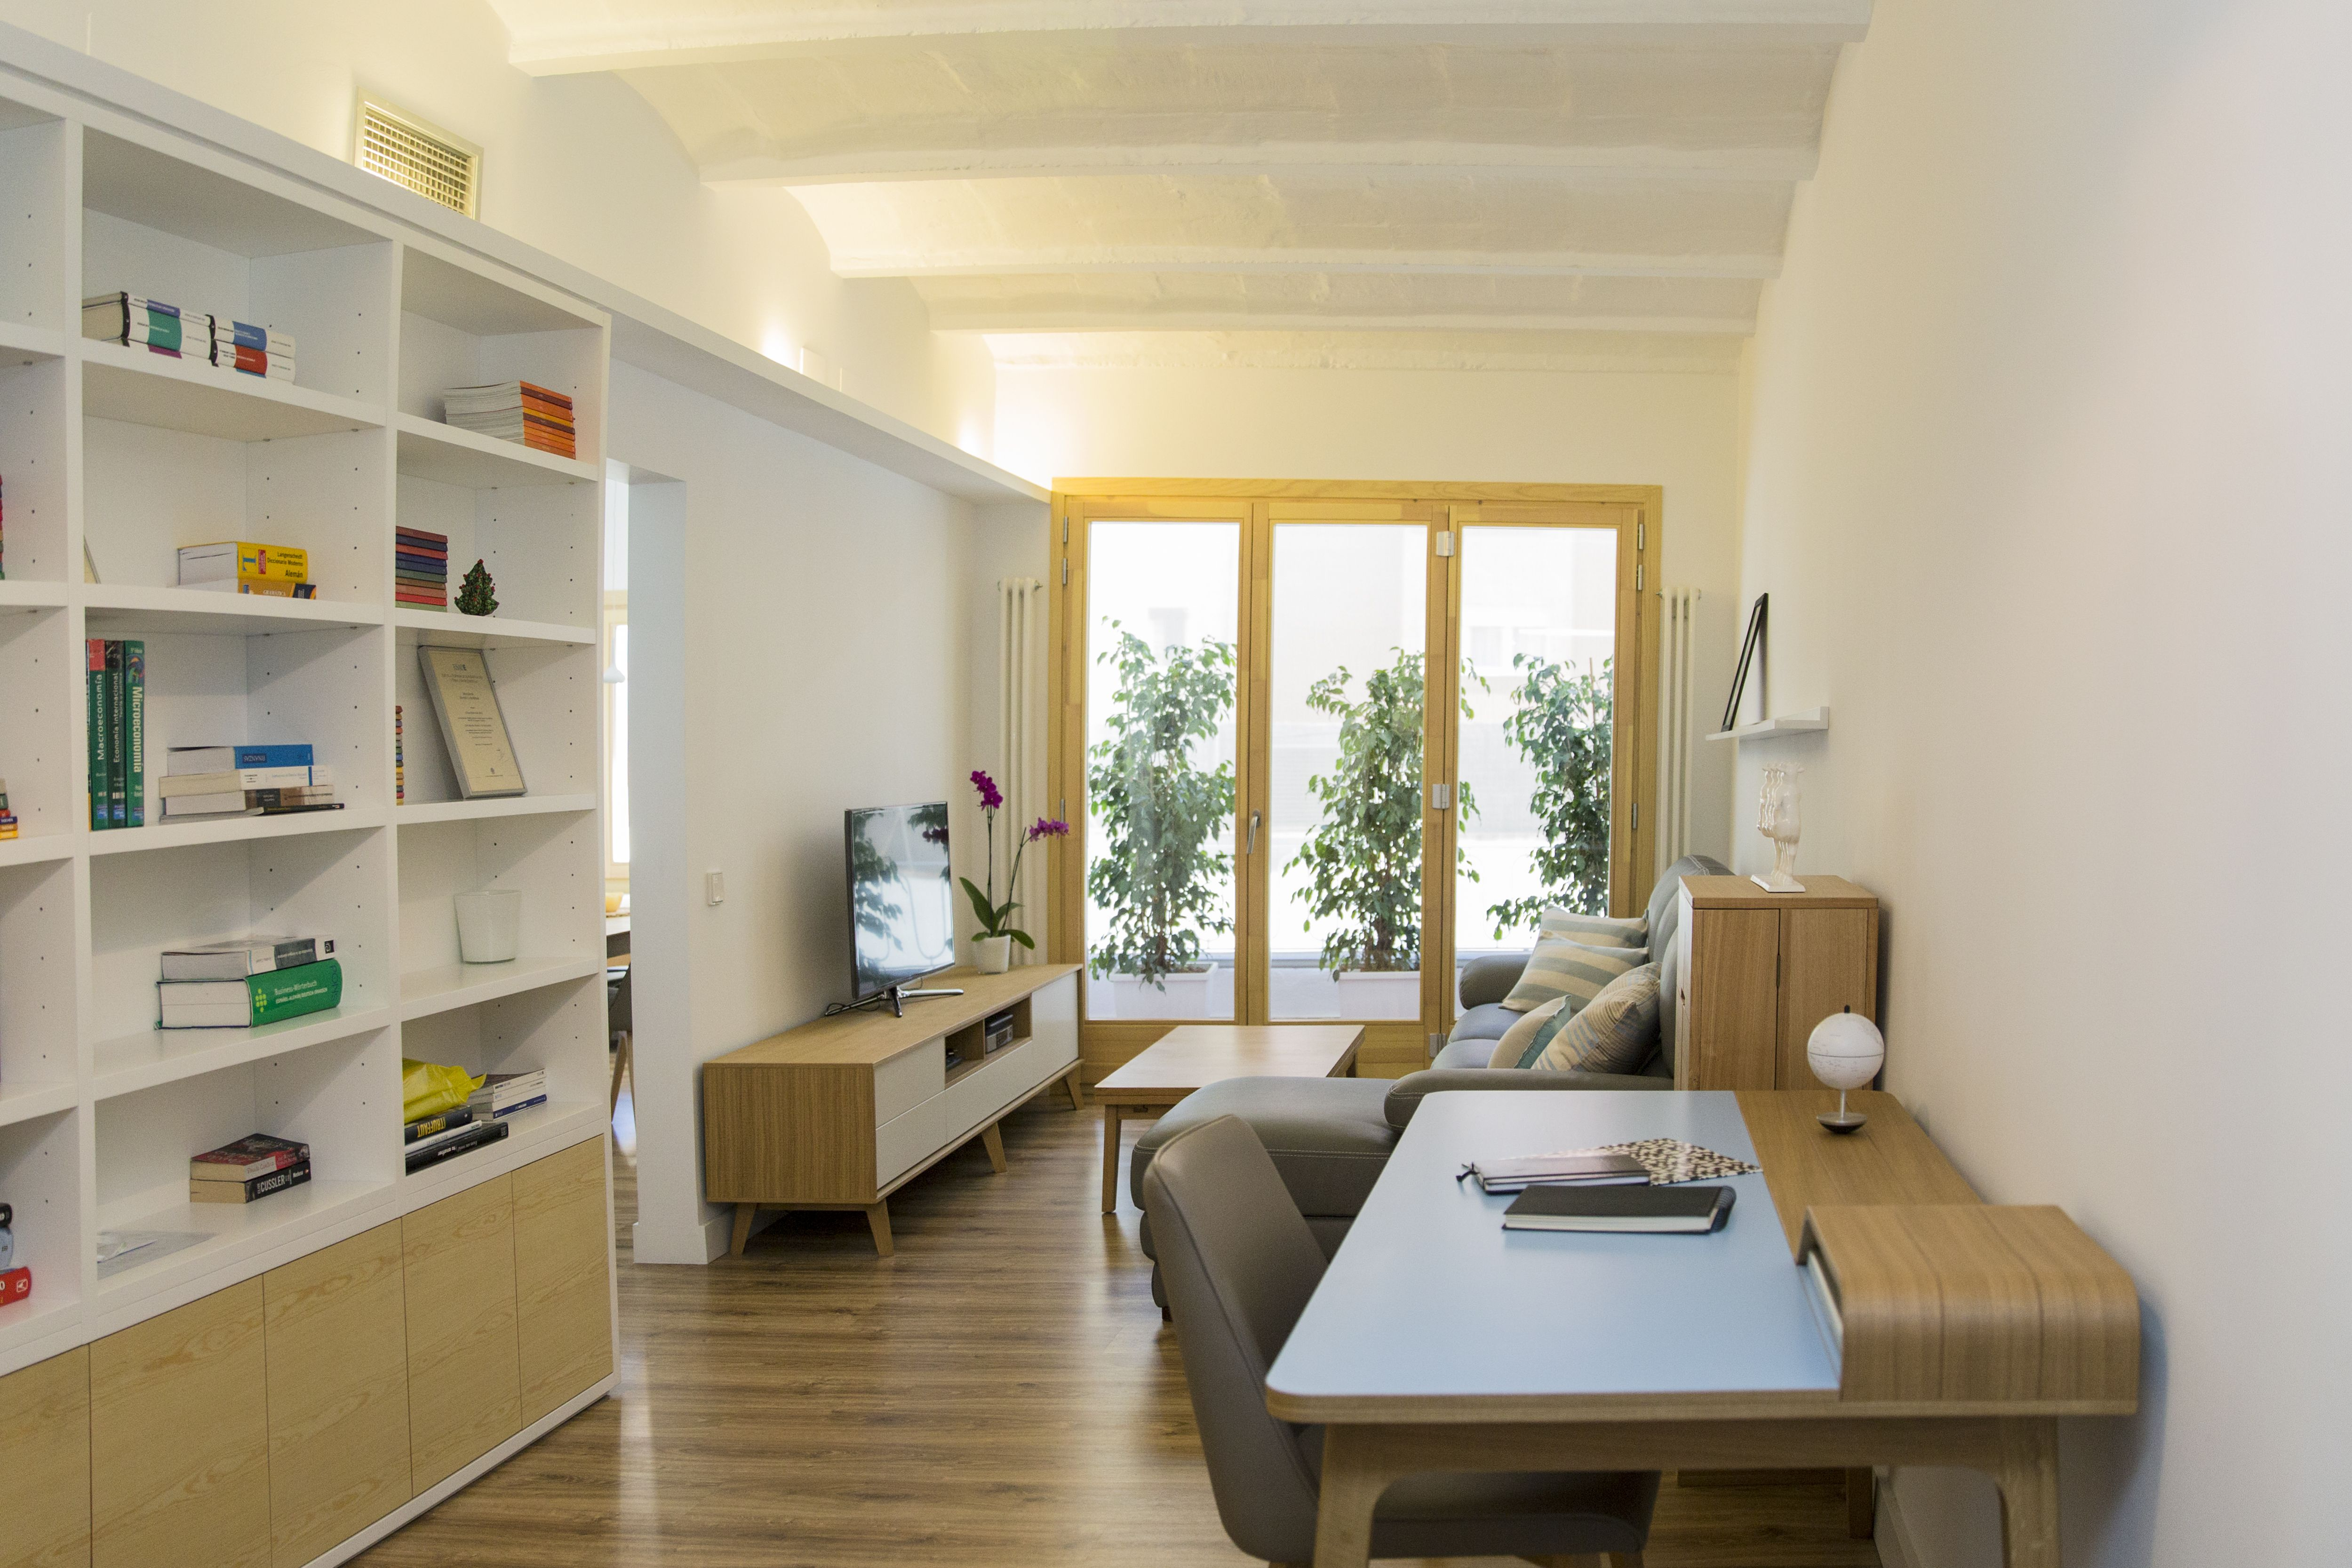 Salon Marron Et Beige Photos ideas de #estudio, salon, terraza, estilo #contemporaneo